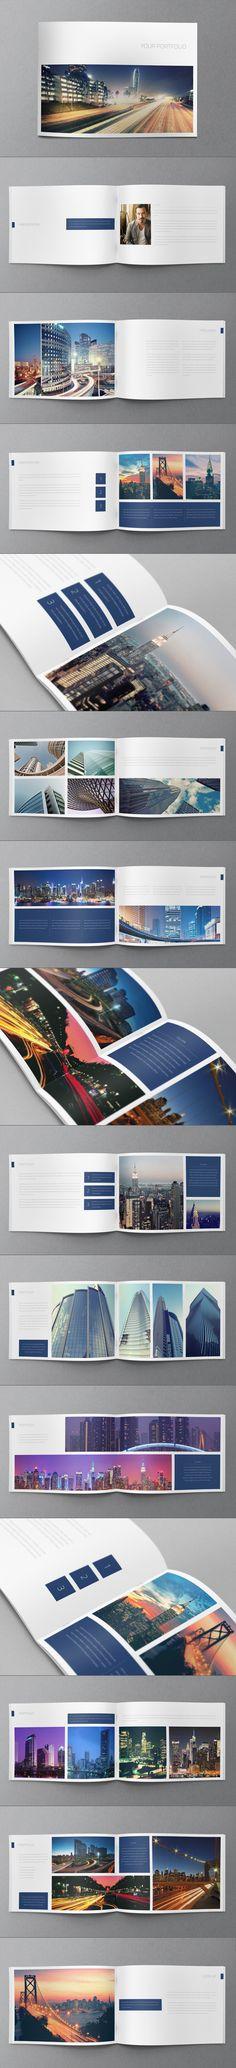 Minimal Brochure Design by Abra Design, via Behance